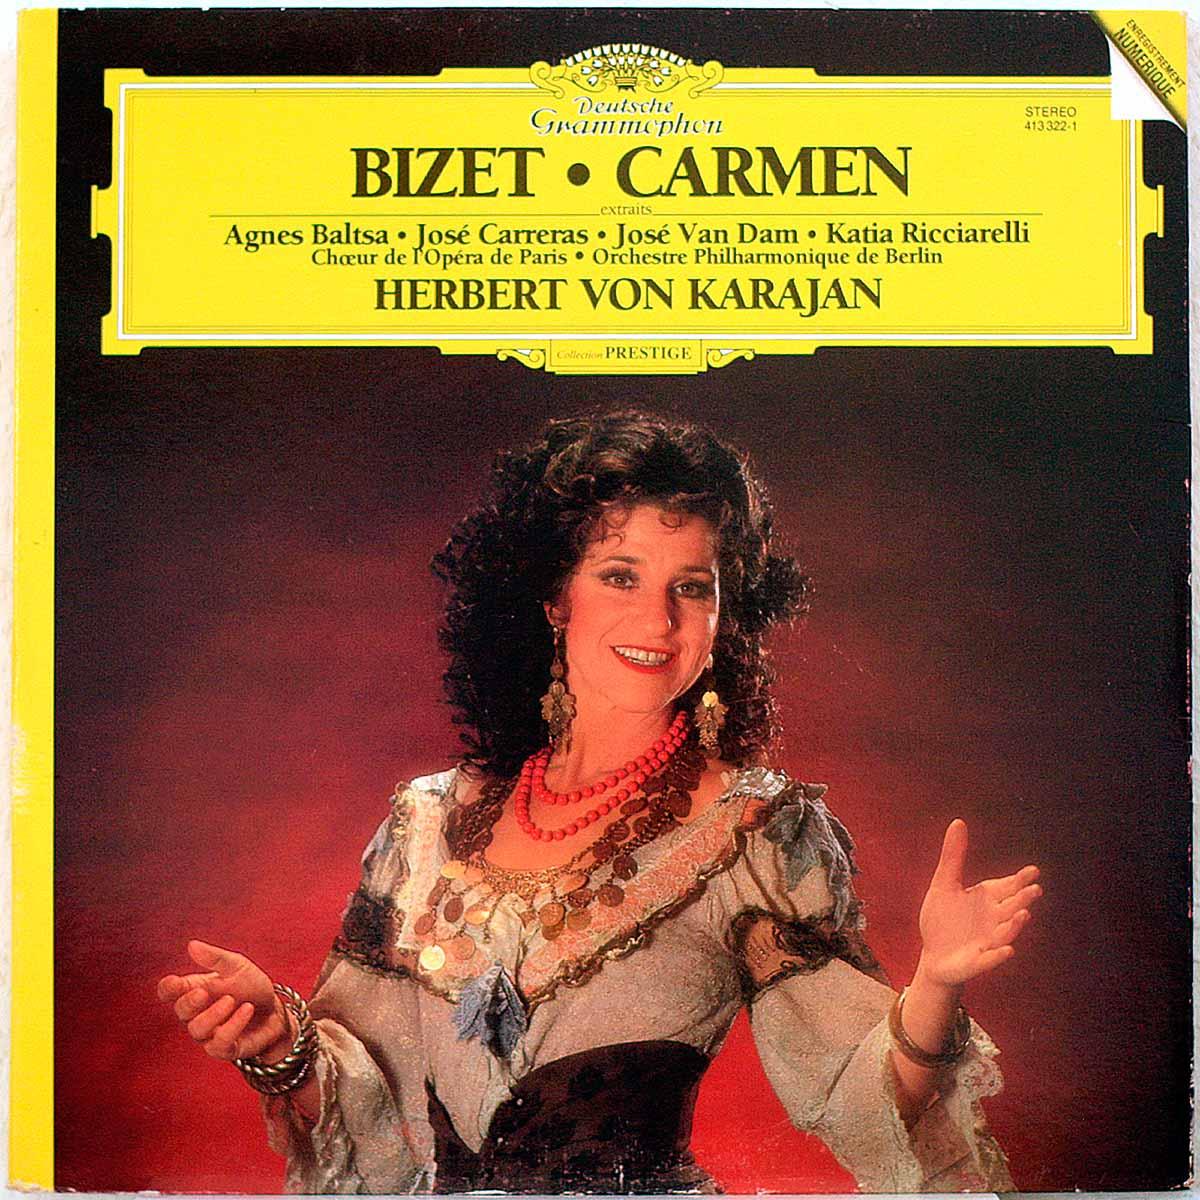 DGG 413 322 Bizet Carmen Karajan DGG Digital Aufnahme